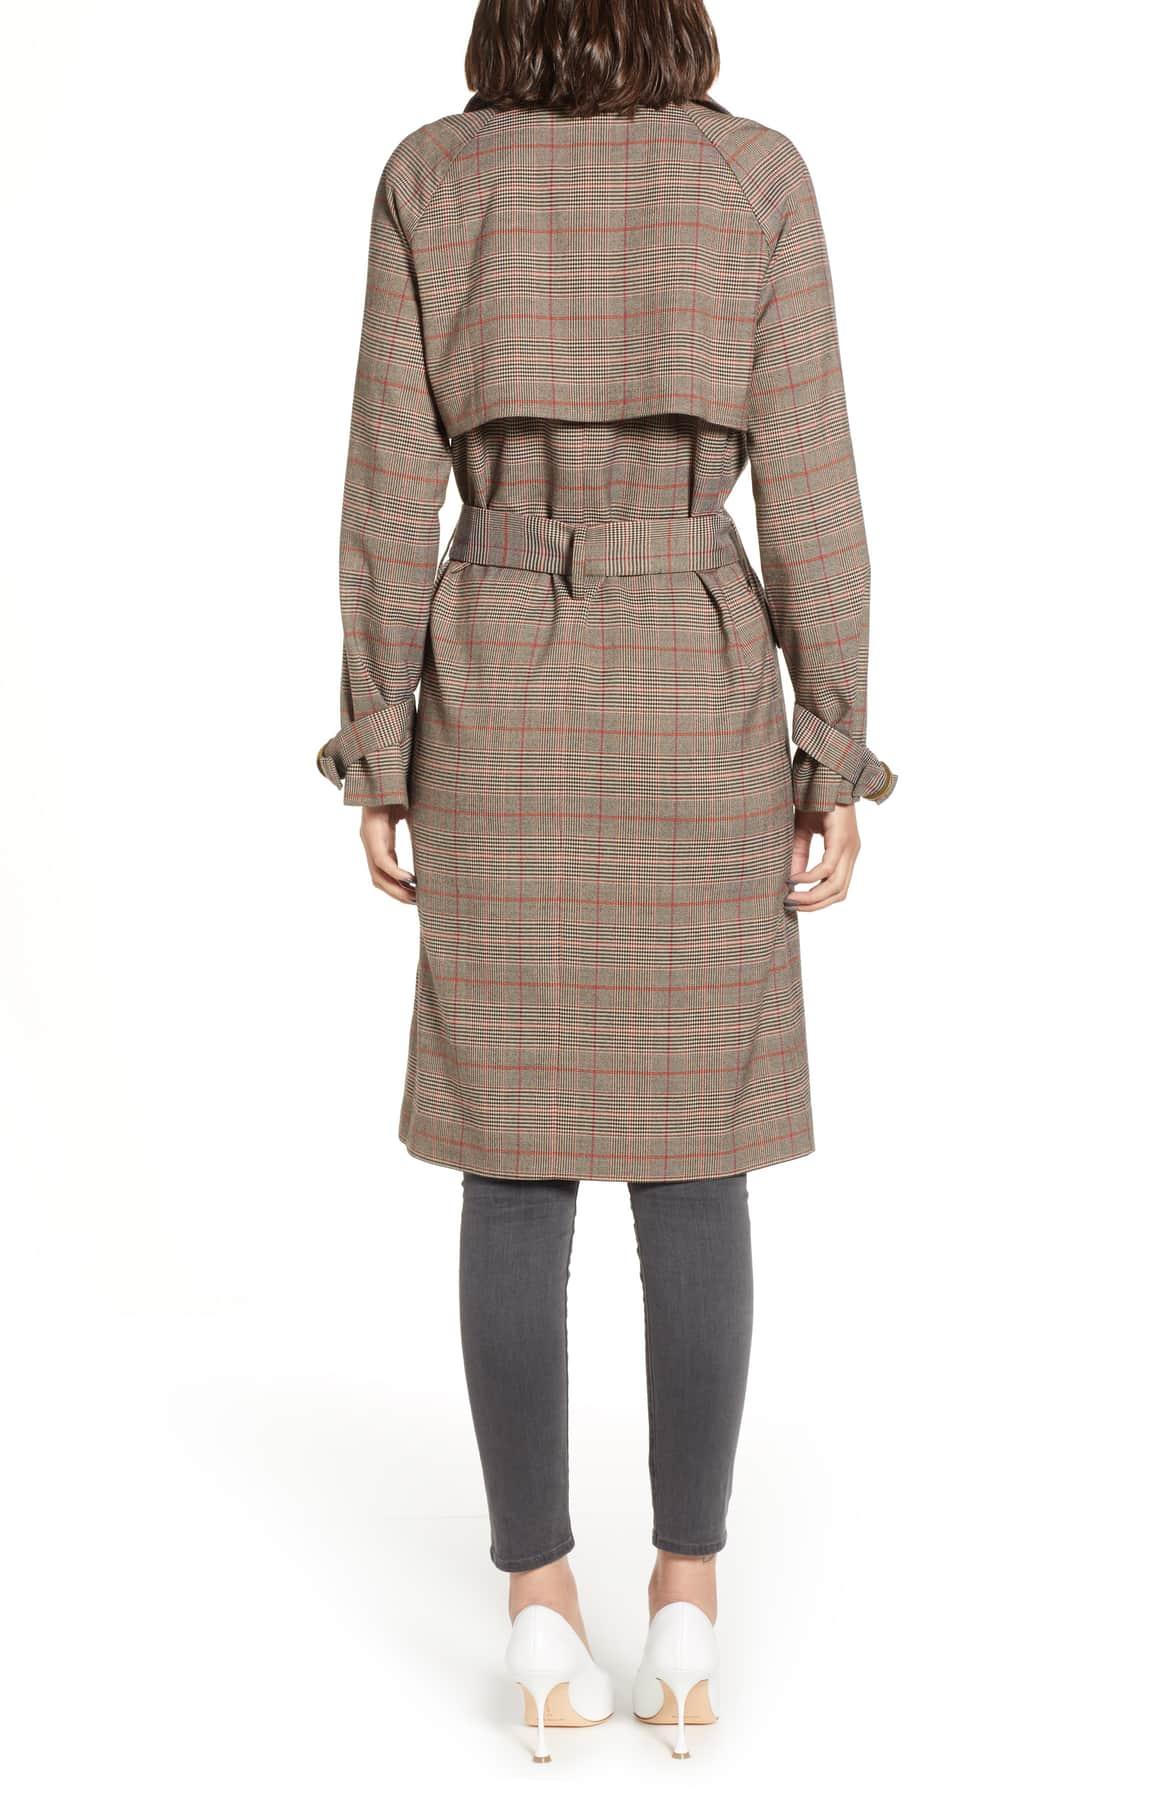 ventless trench coat